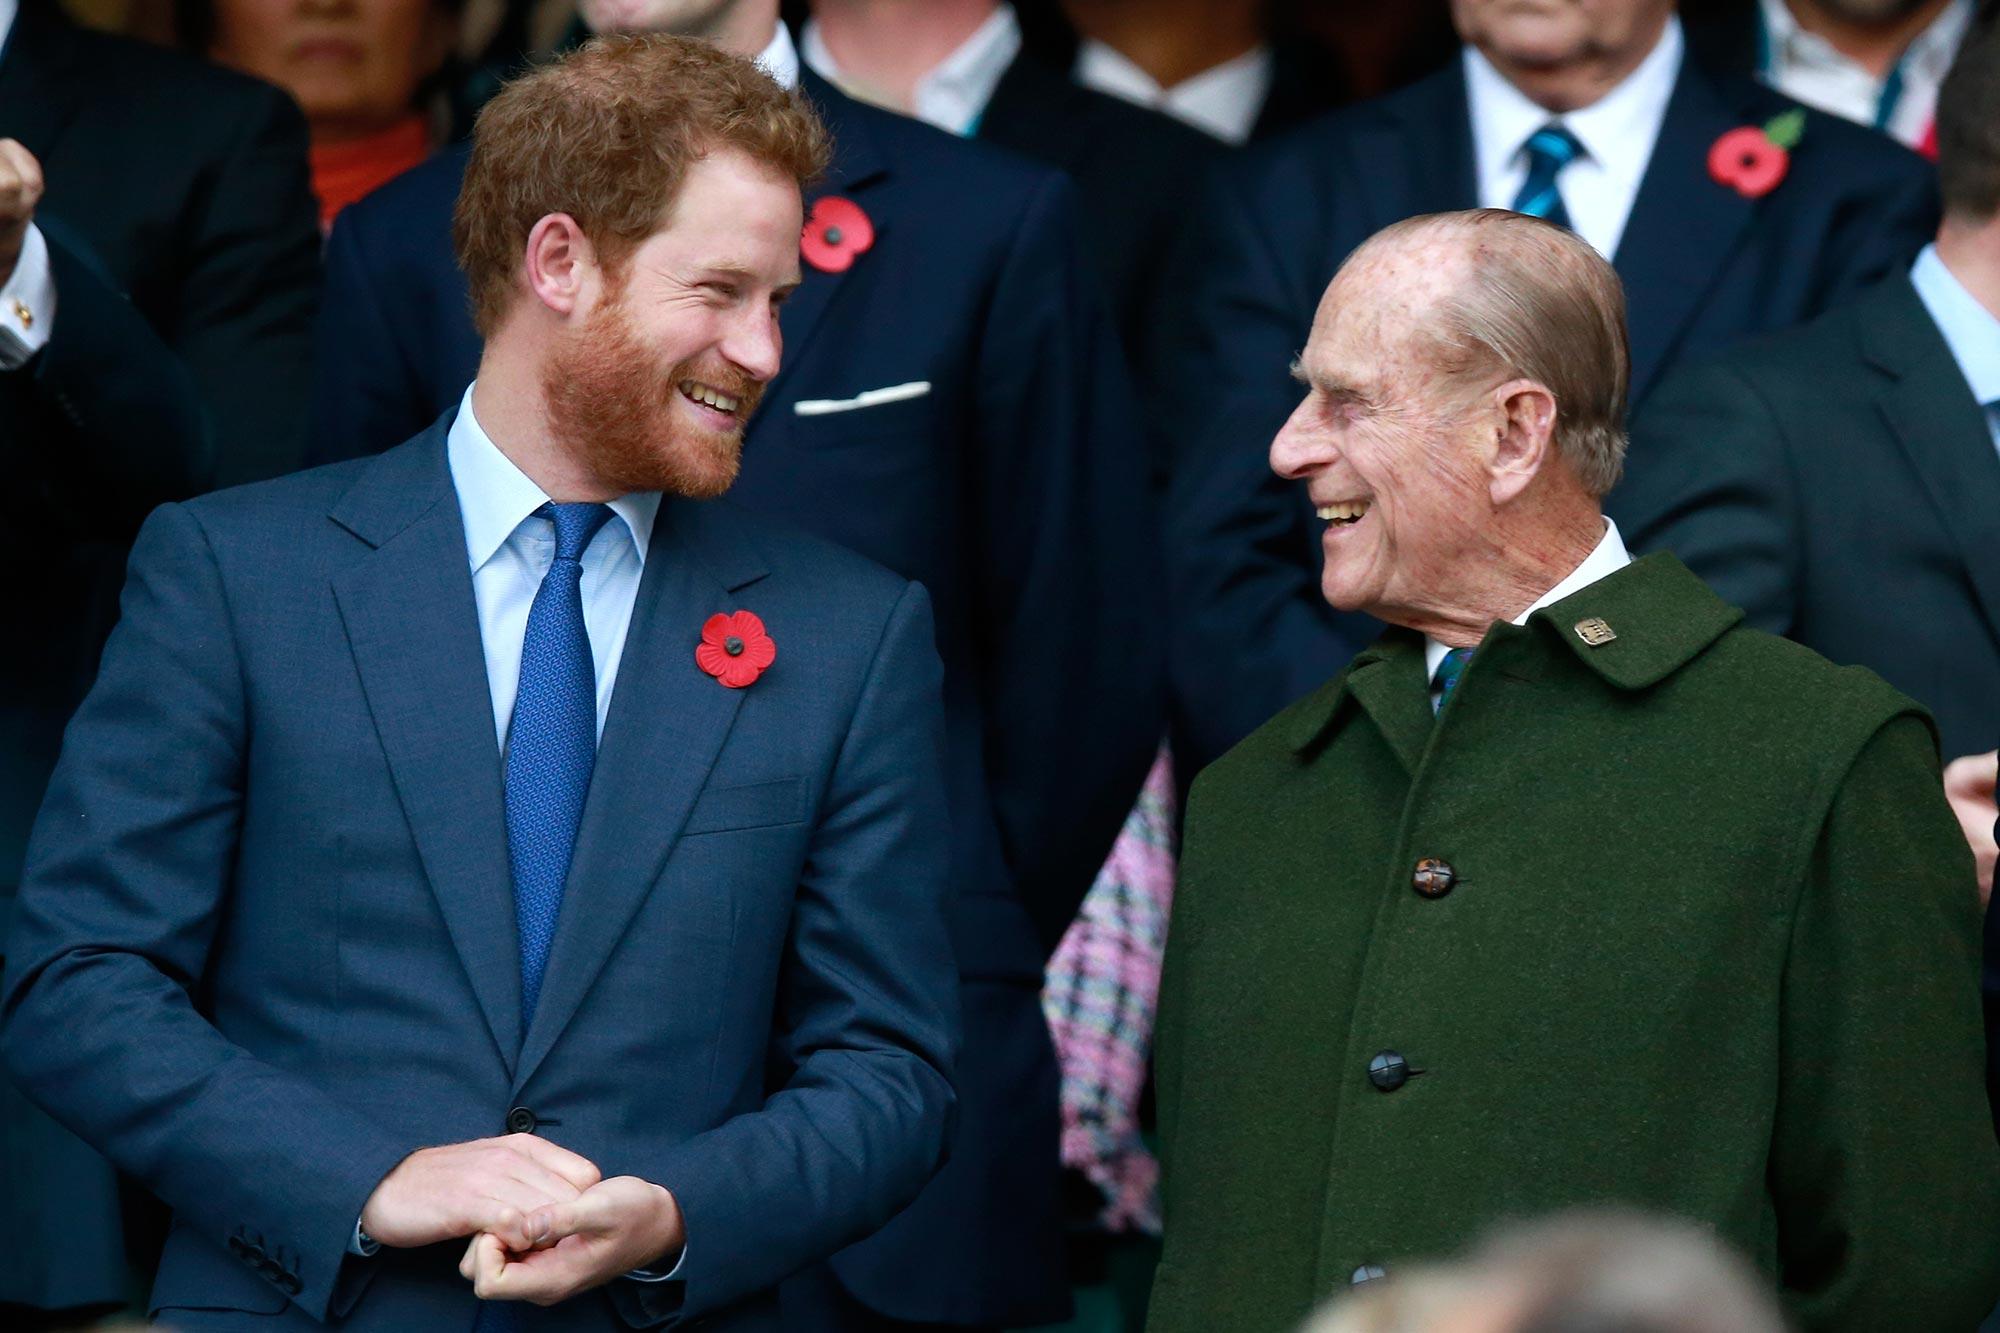 Prince Harry, Prince Phillip